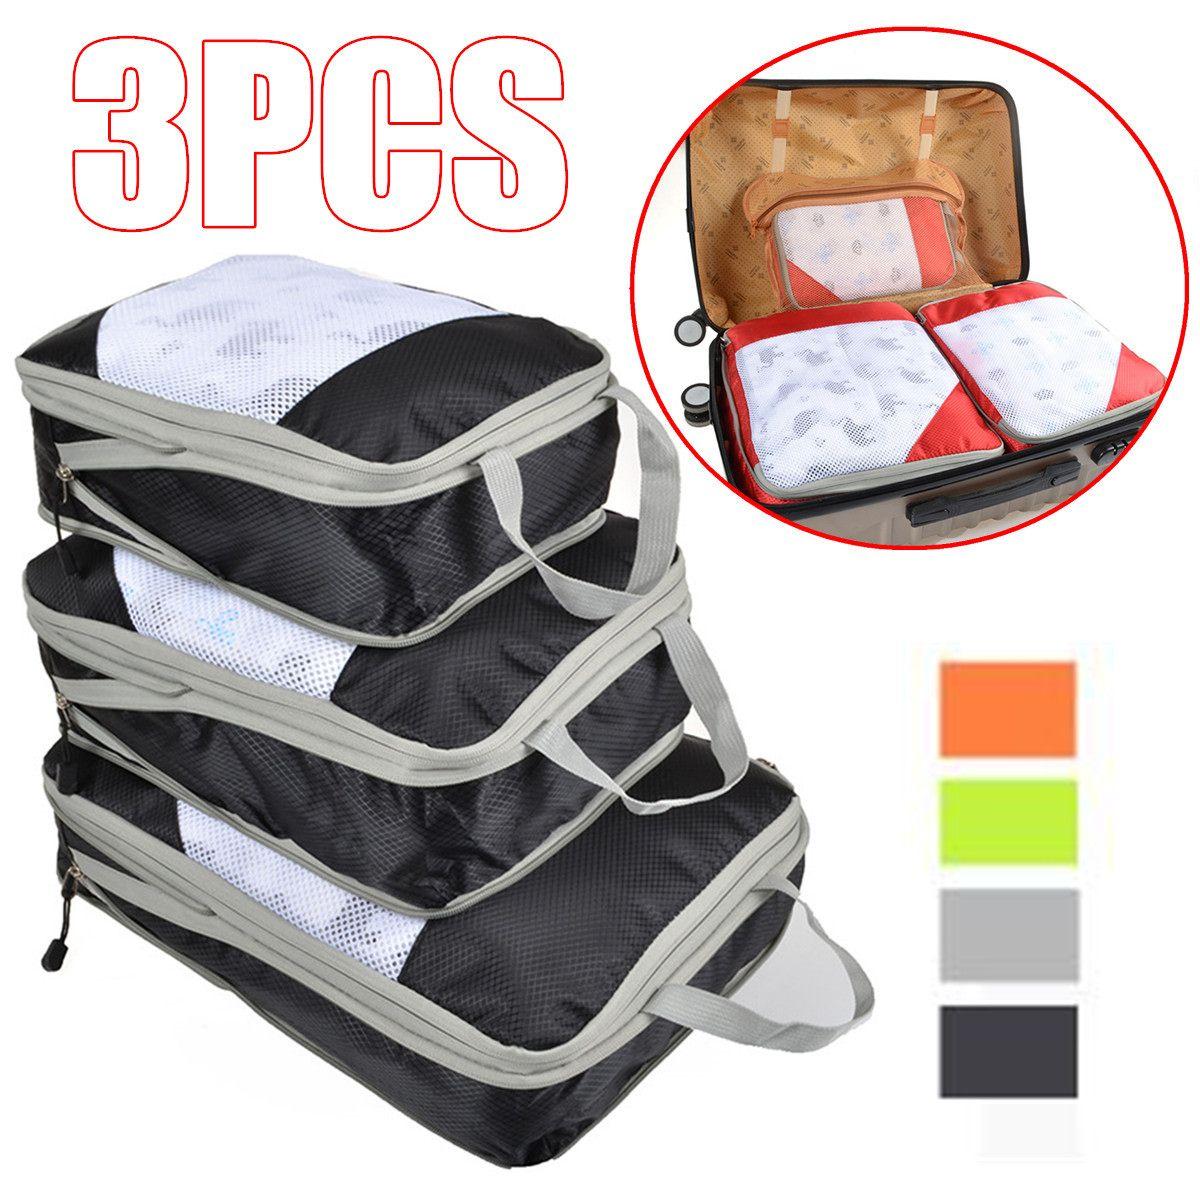 UK 6PCS Travel Luggage Suitcase Organiser Packing Cubes Set Bag Backpack Pouches